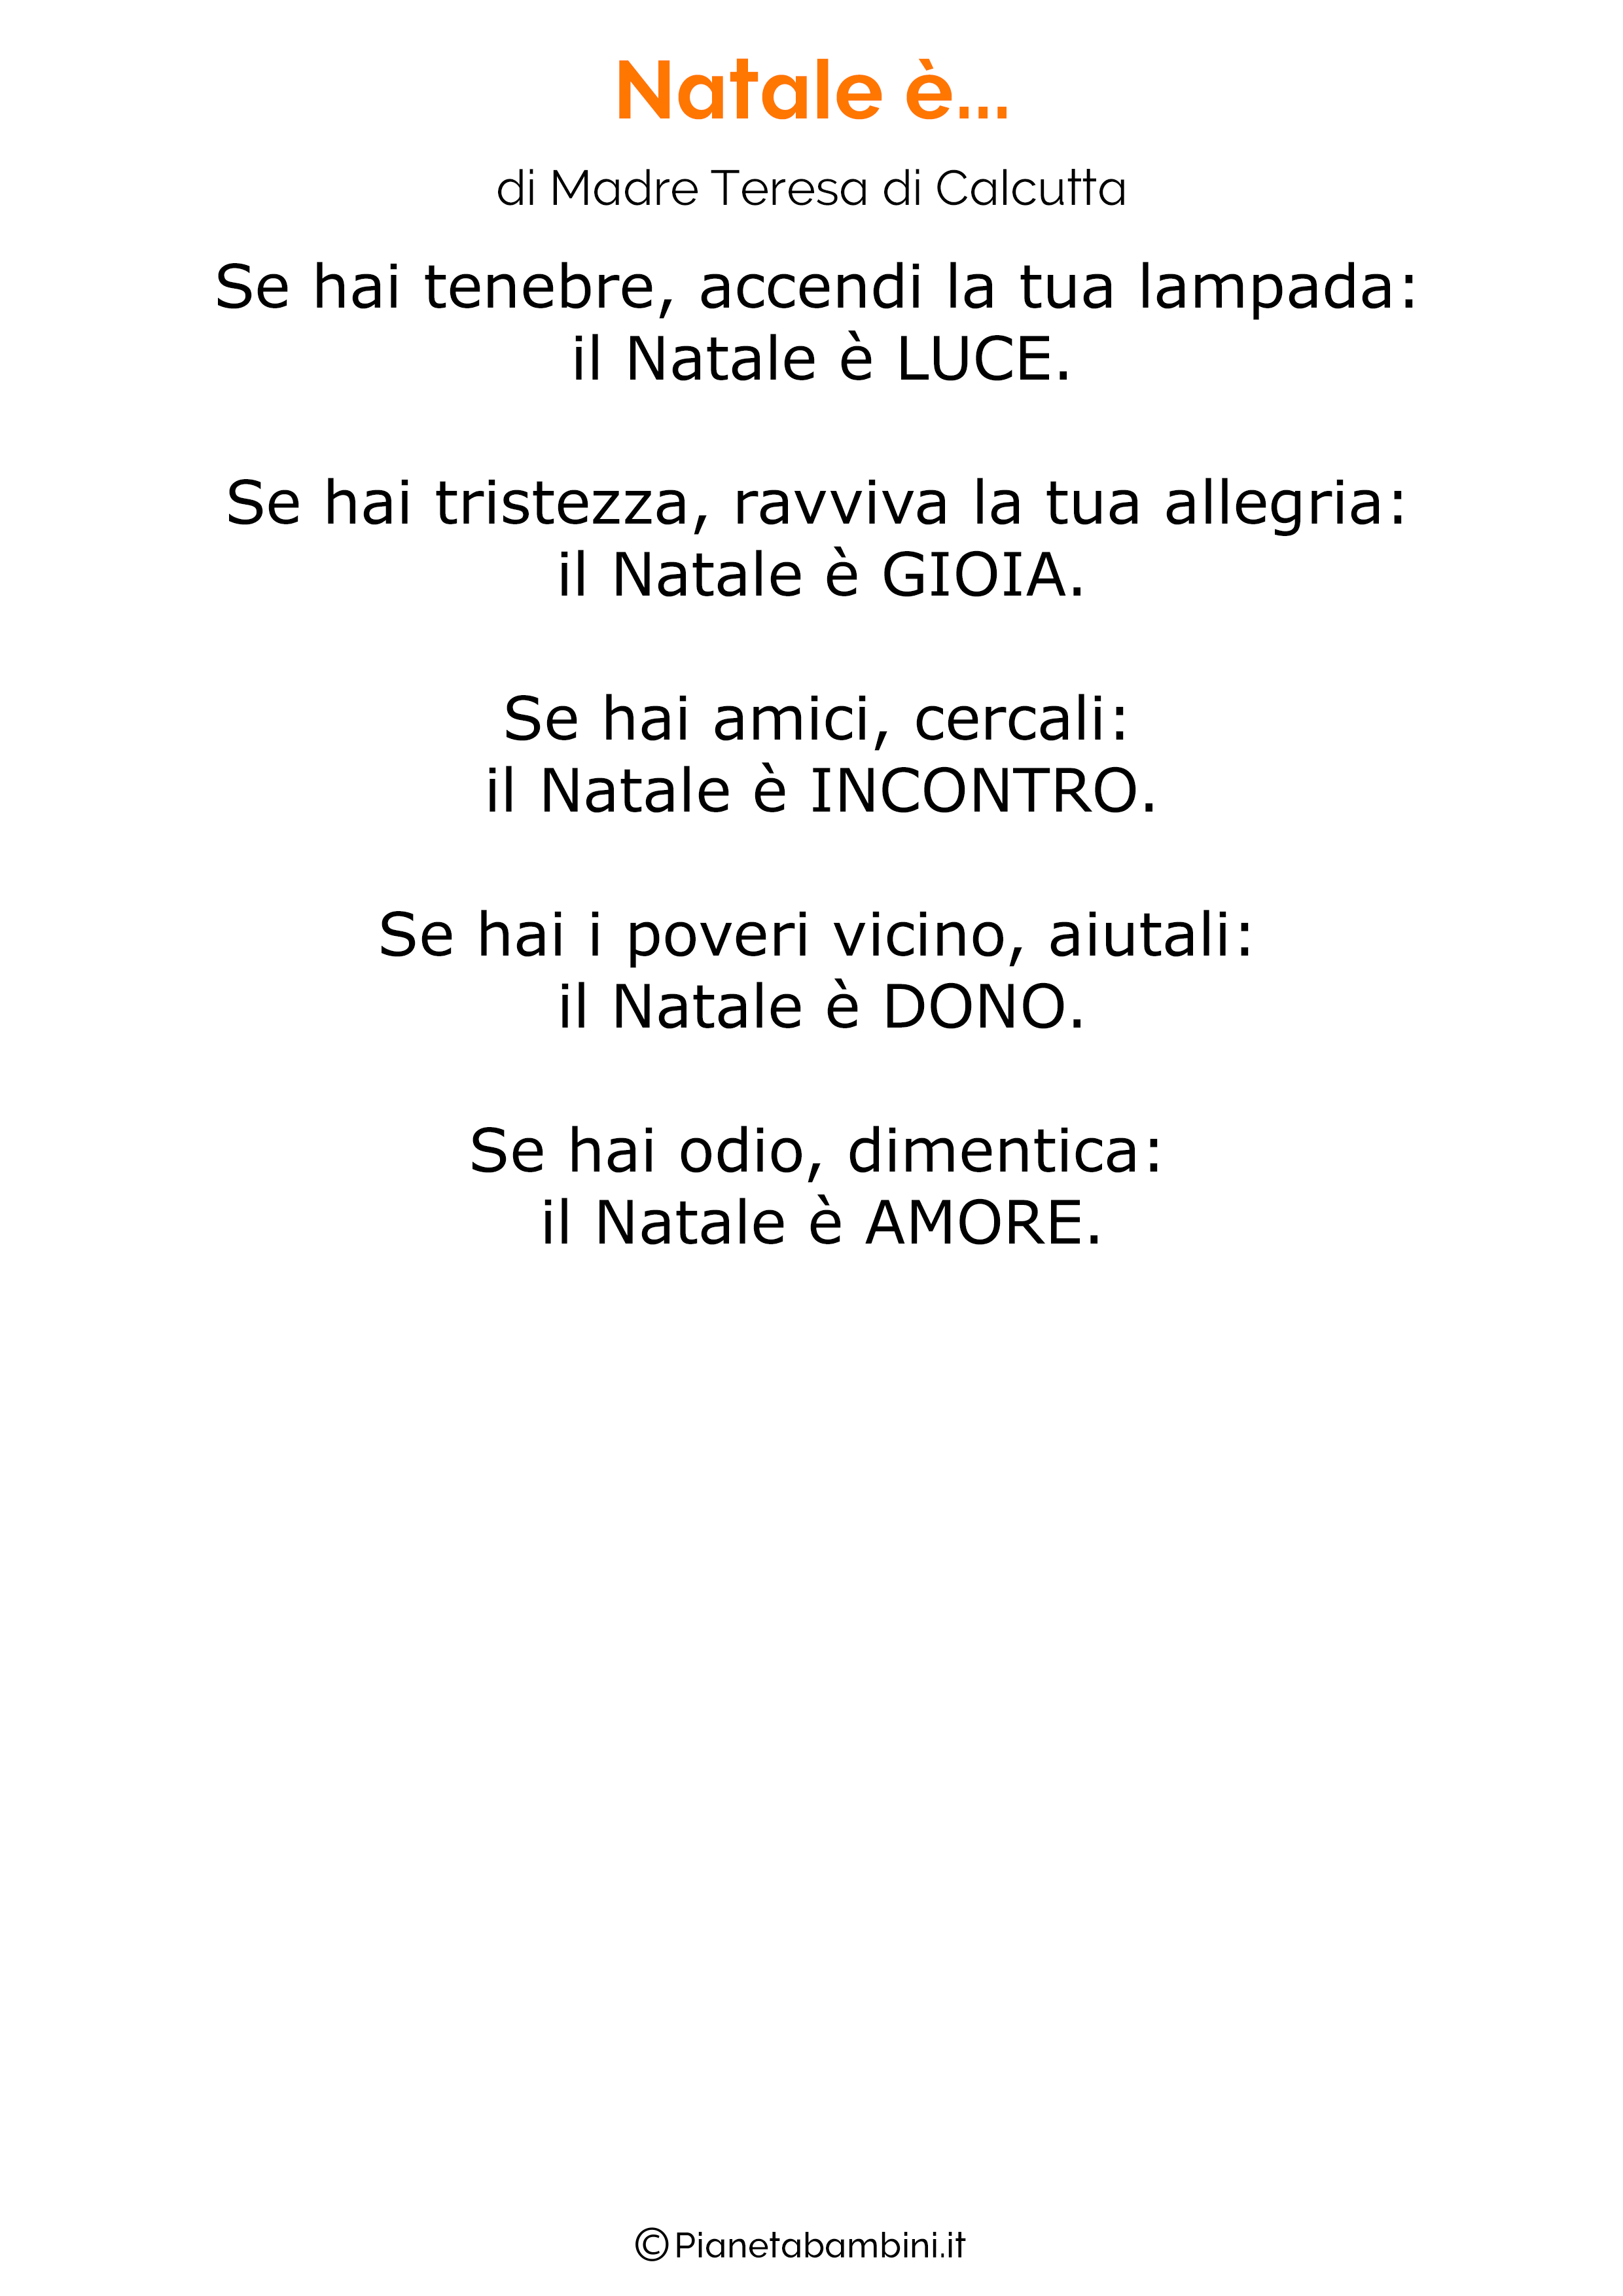 Poesia di Natale autori classici 10